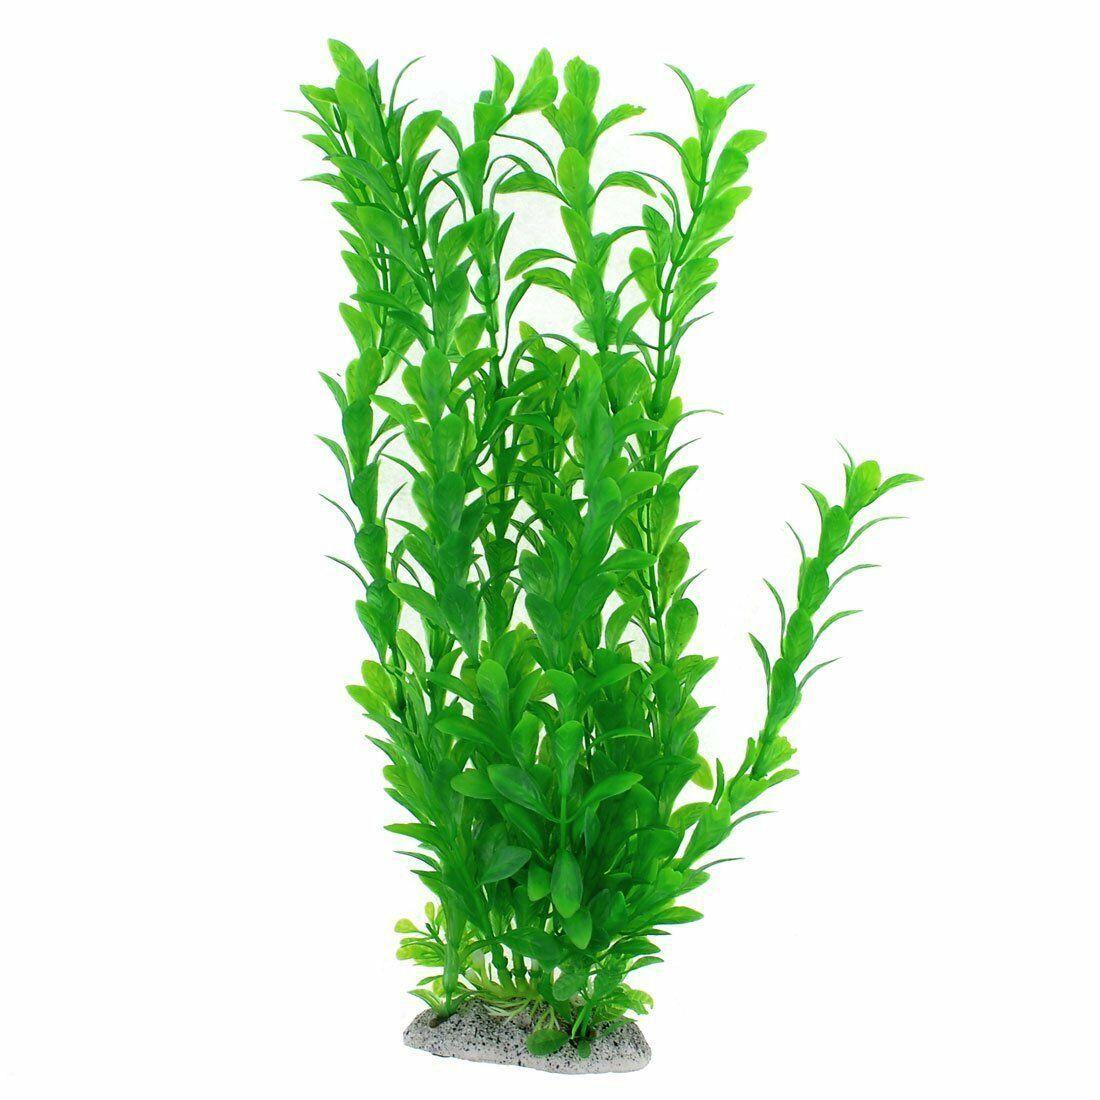 NEW Uxcell 13-Inch Green Emulational Aquarium Water Grass Plant Decoration NIP